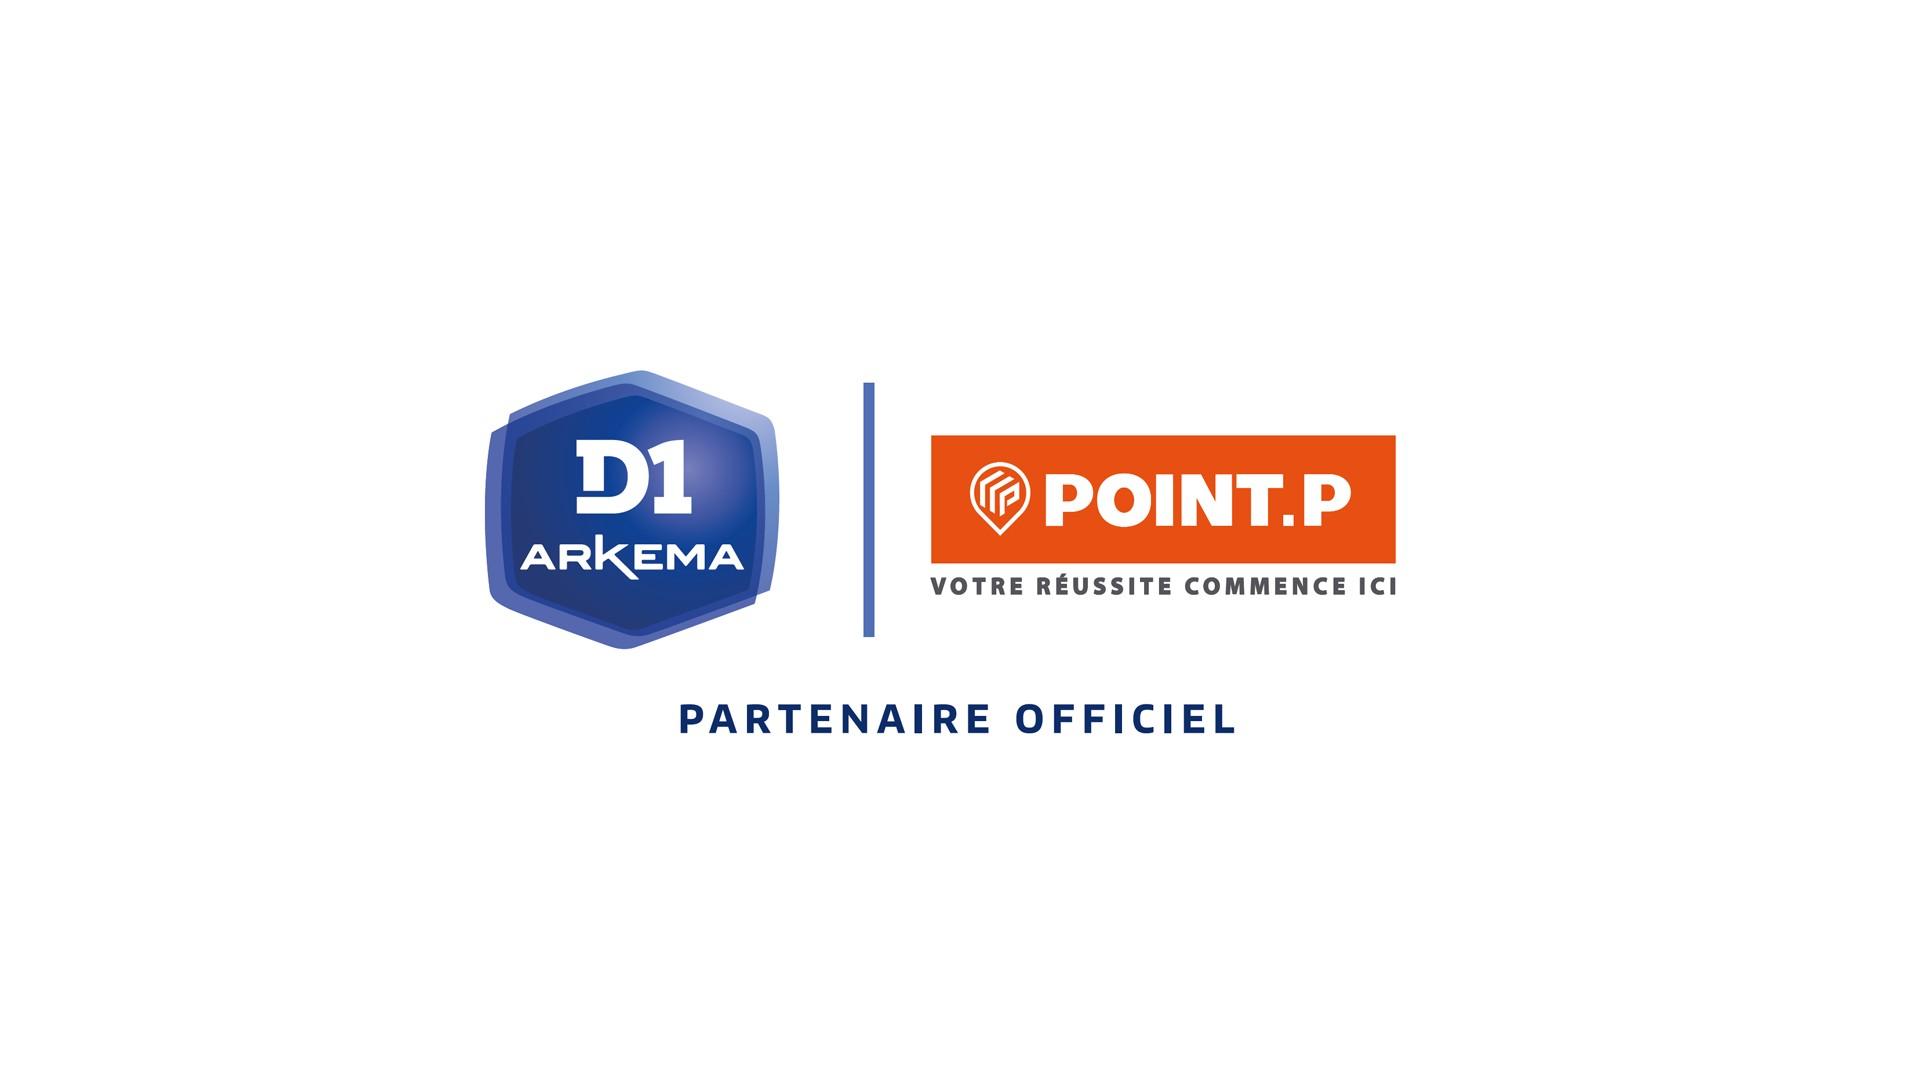 Point P x D1 (football) 2021